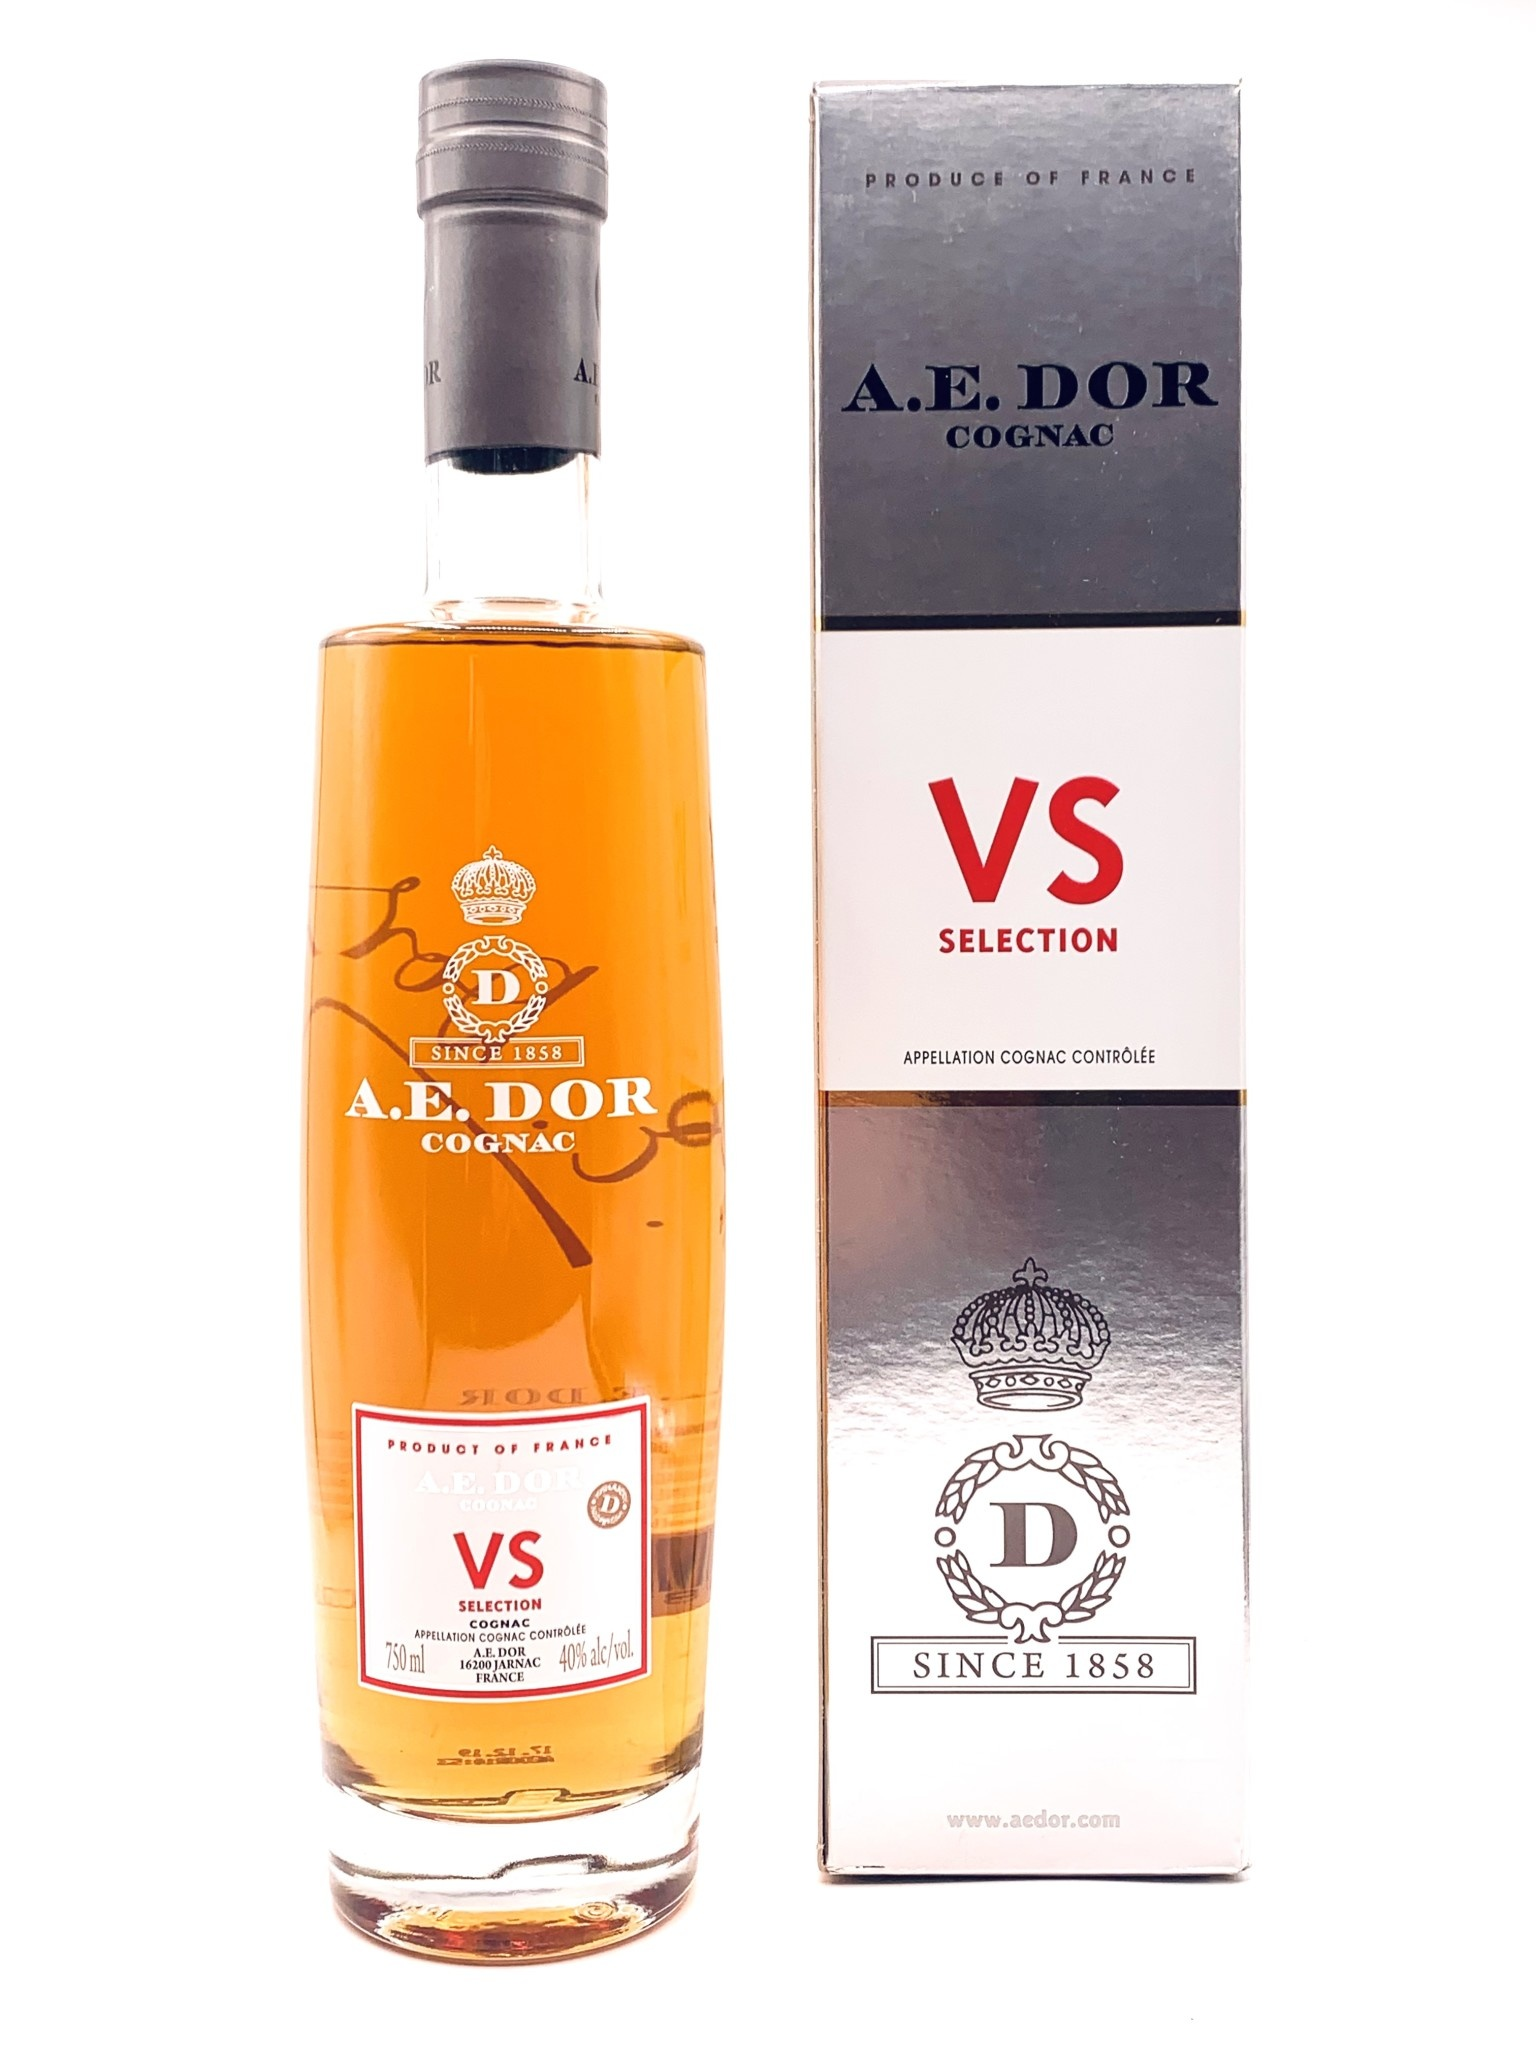 A E DOR Cognac VS 750ml (80 Proof)